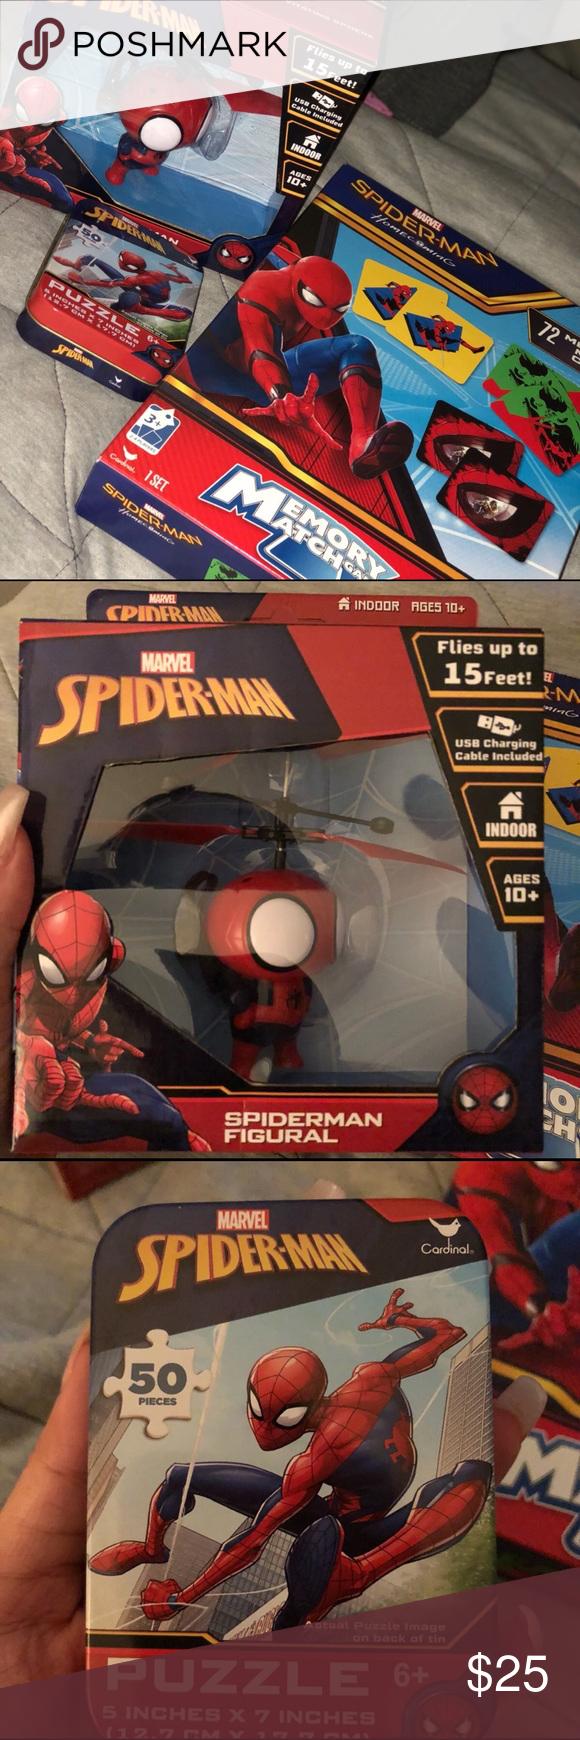 SpiderMan Bundle Spiderman, Card games, Video game covers